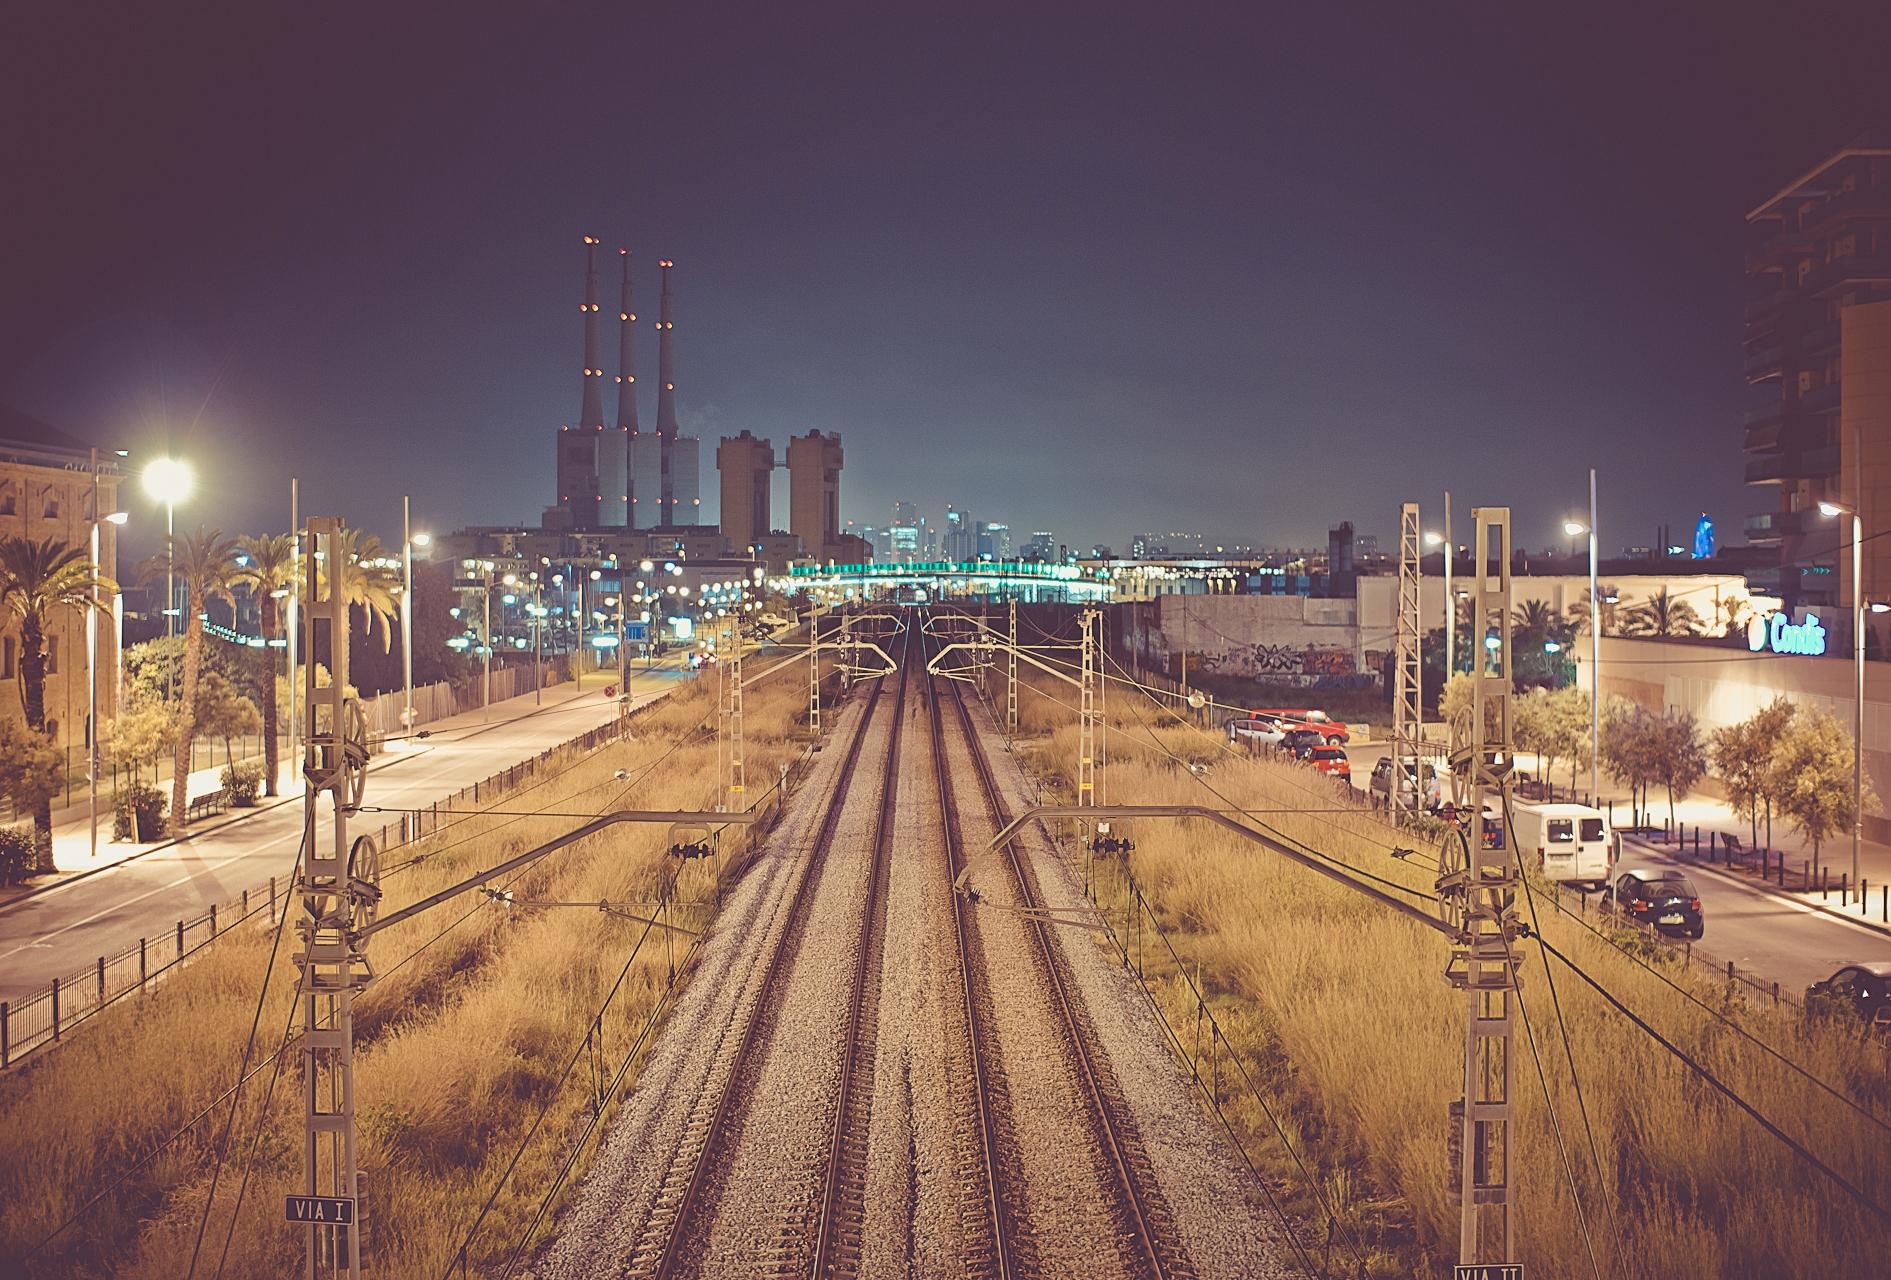 ville-energie-unsplash